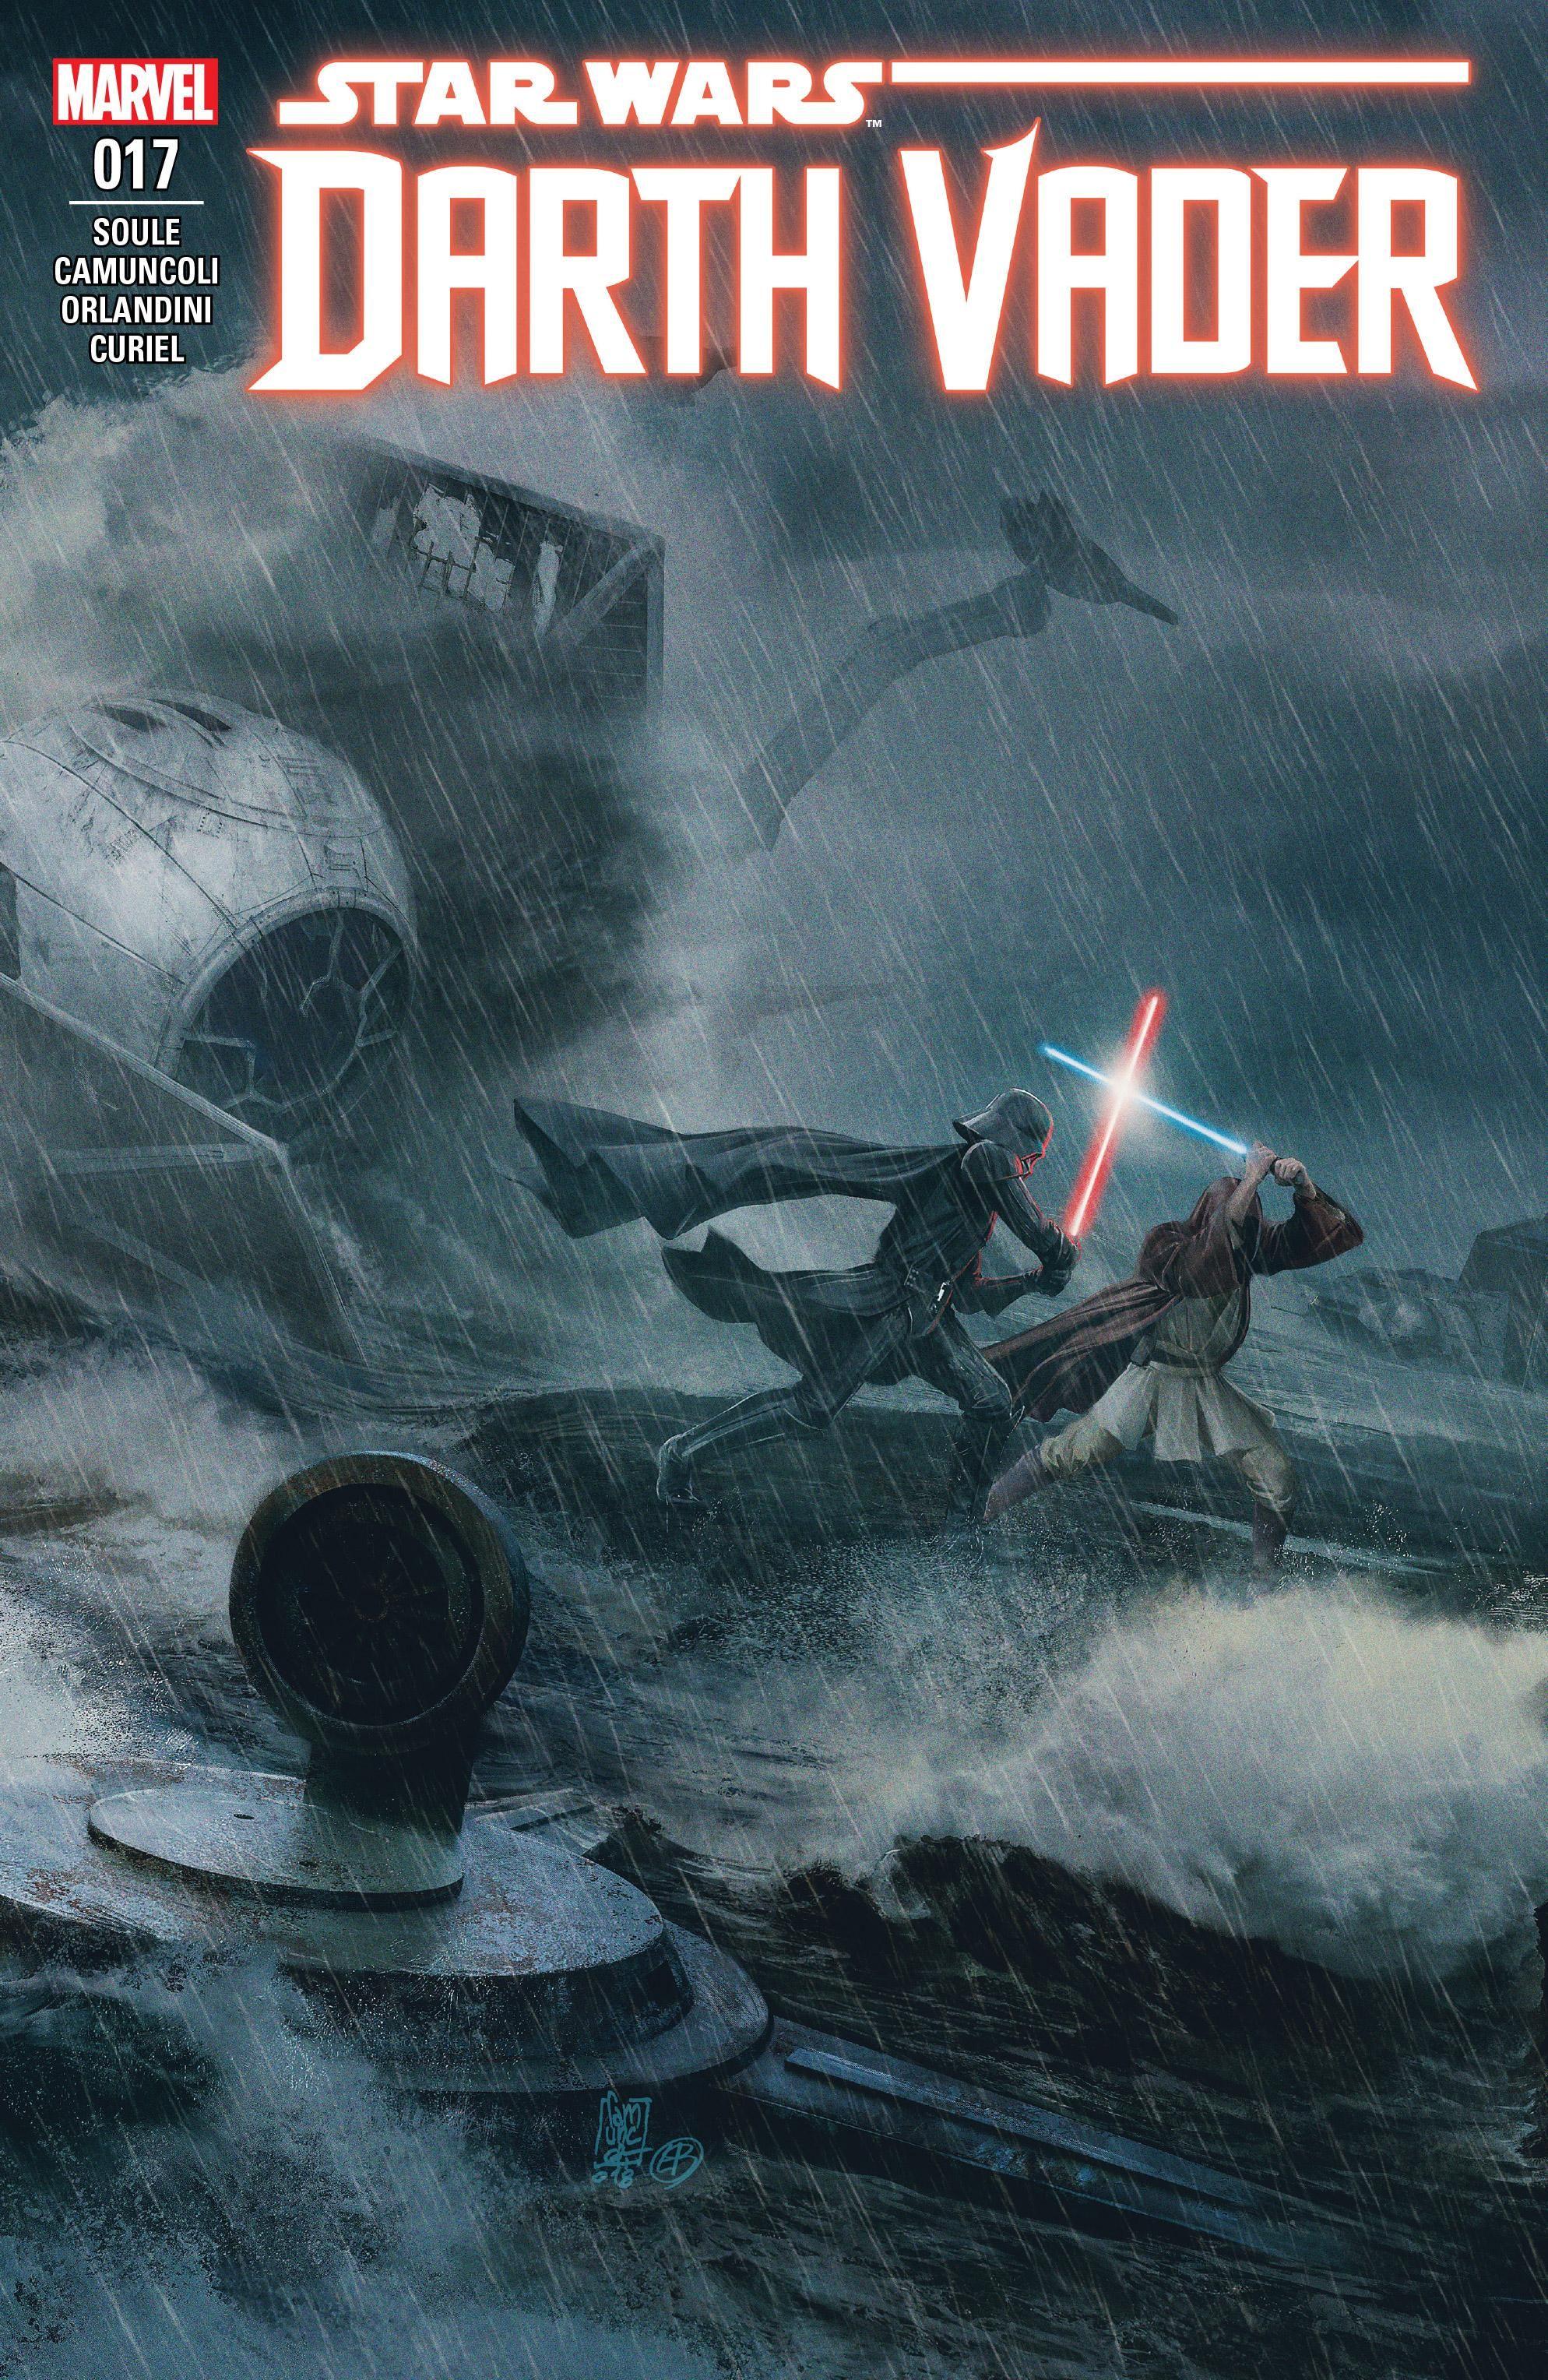 Darth Vader Dark Lord Of The Sith 17 Star Wars Comic Books Star Wars Comics Star Wars